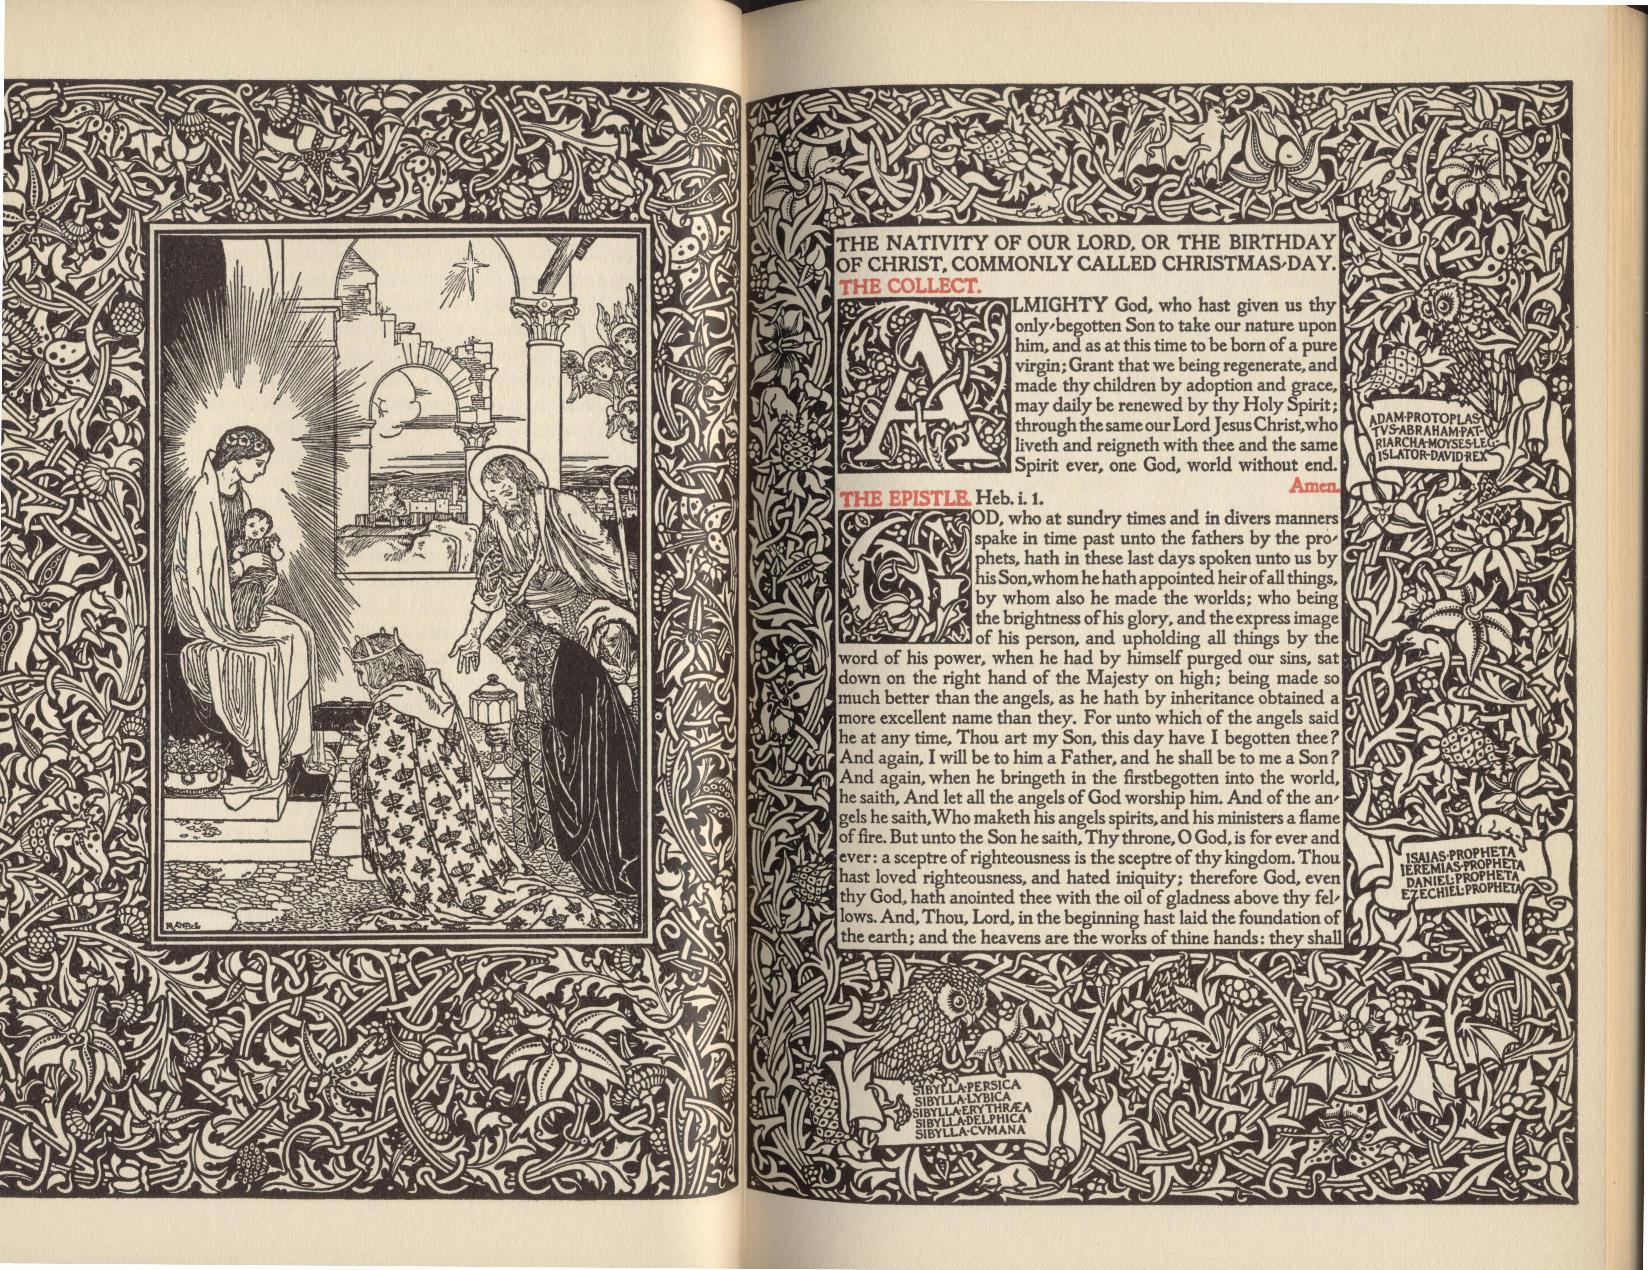 The Altar Book, designed by Daniel Berkeley Updike in 1896.